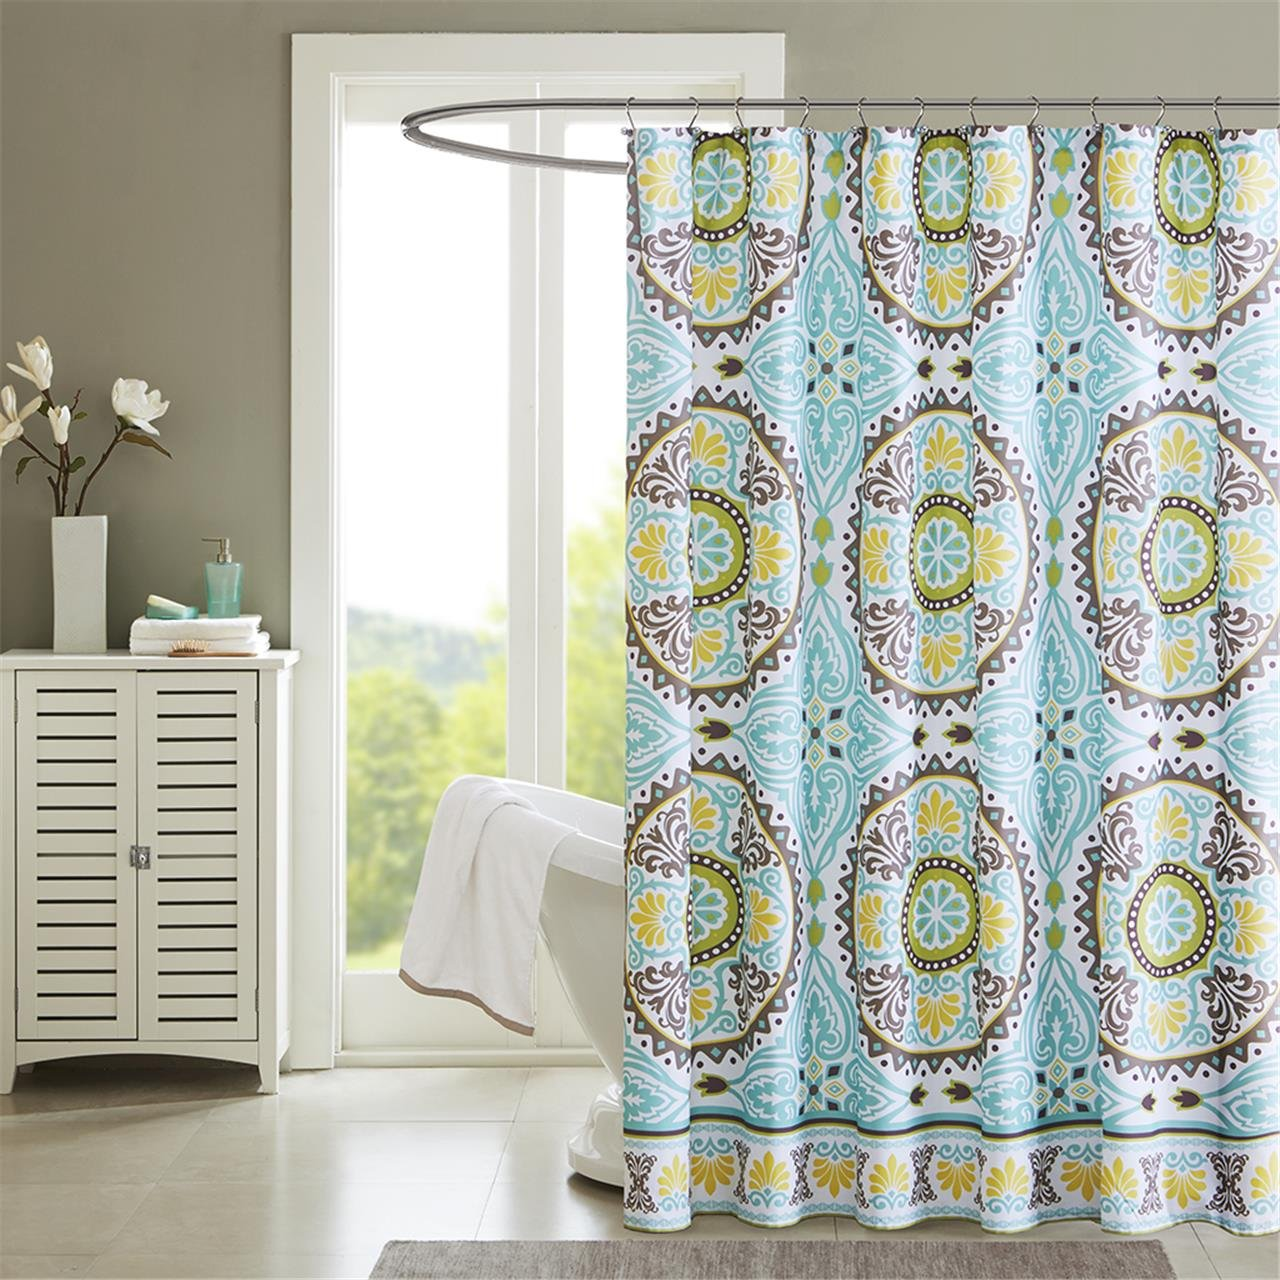 Amazon.com: Madison Park MP70-1921 Samara Shower Curtain 72x72 Aqua ...